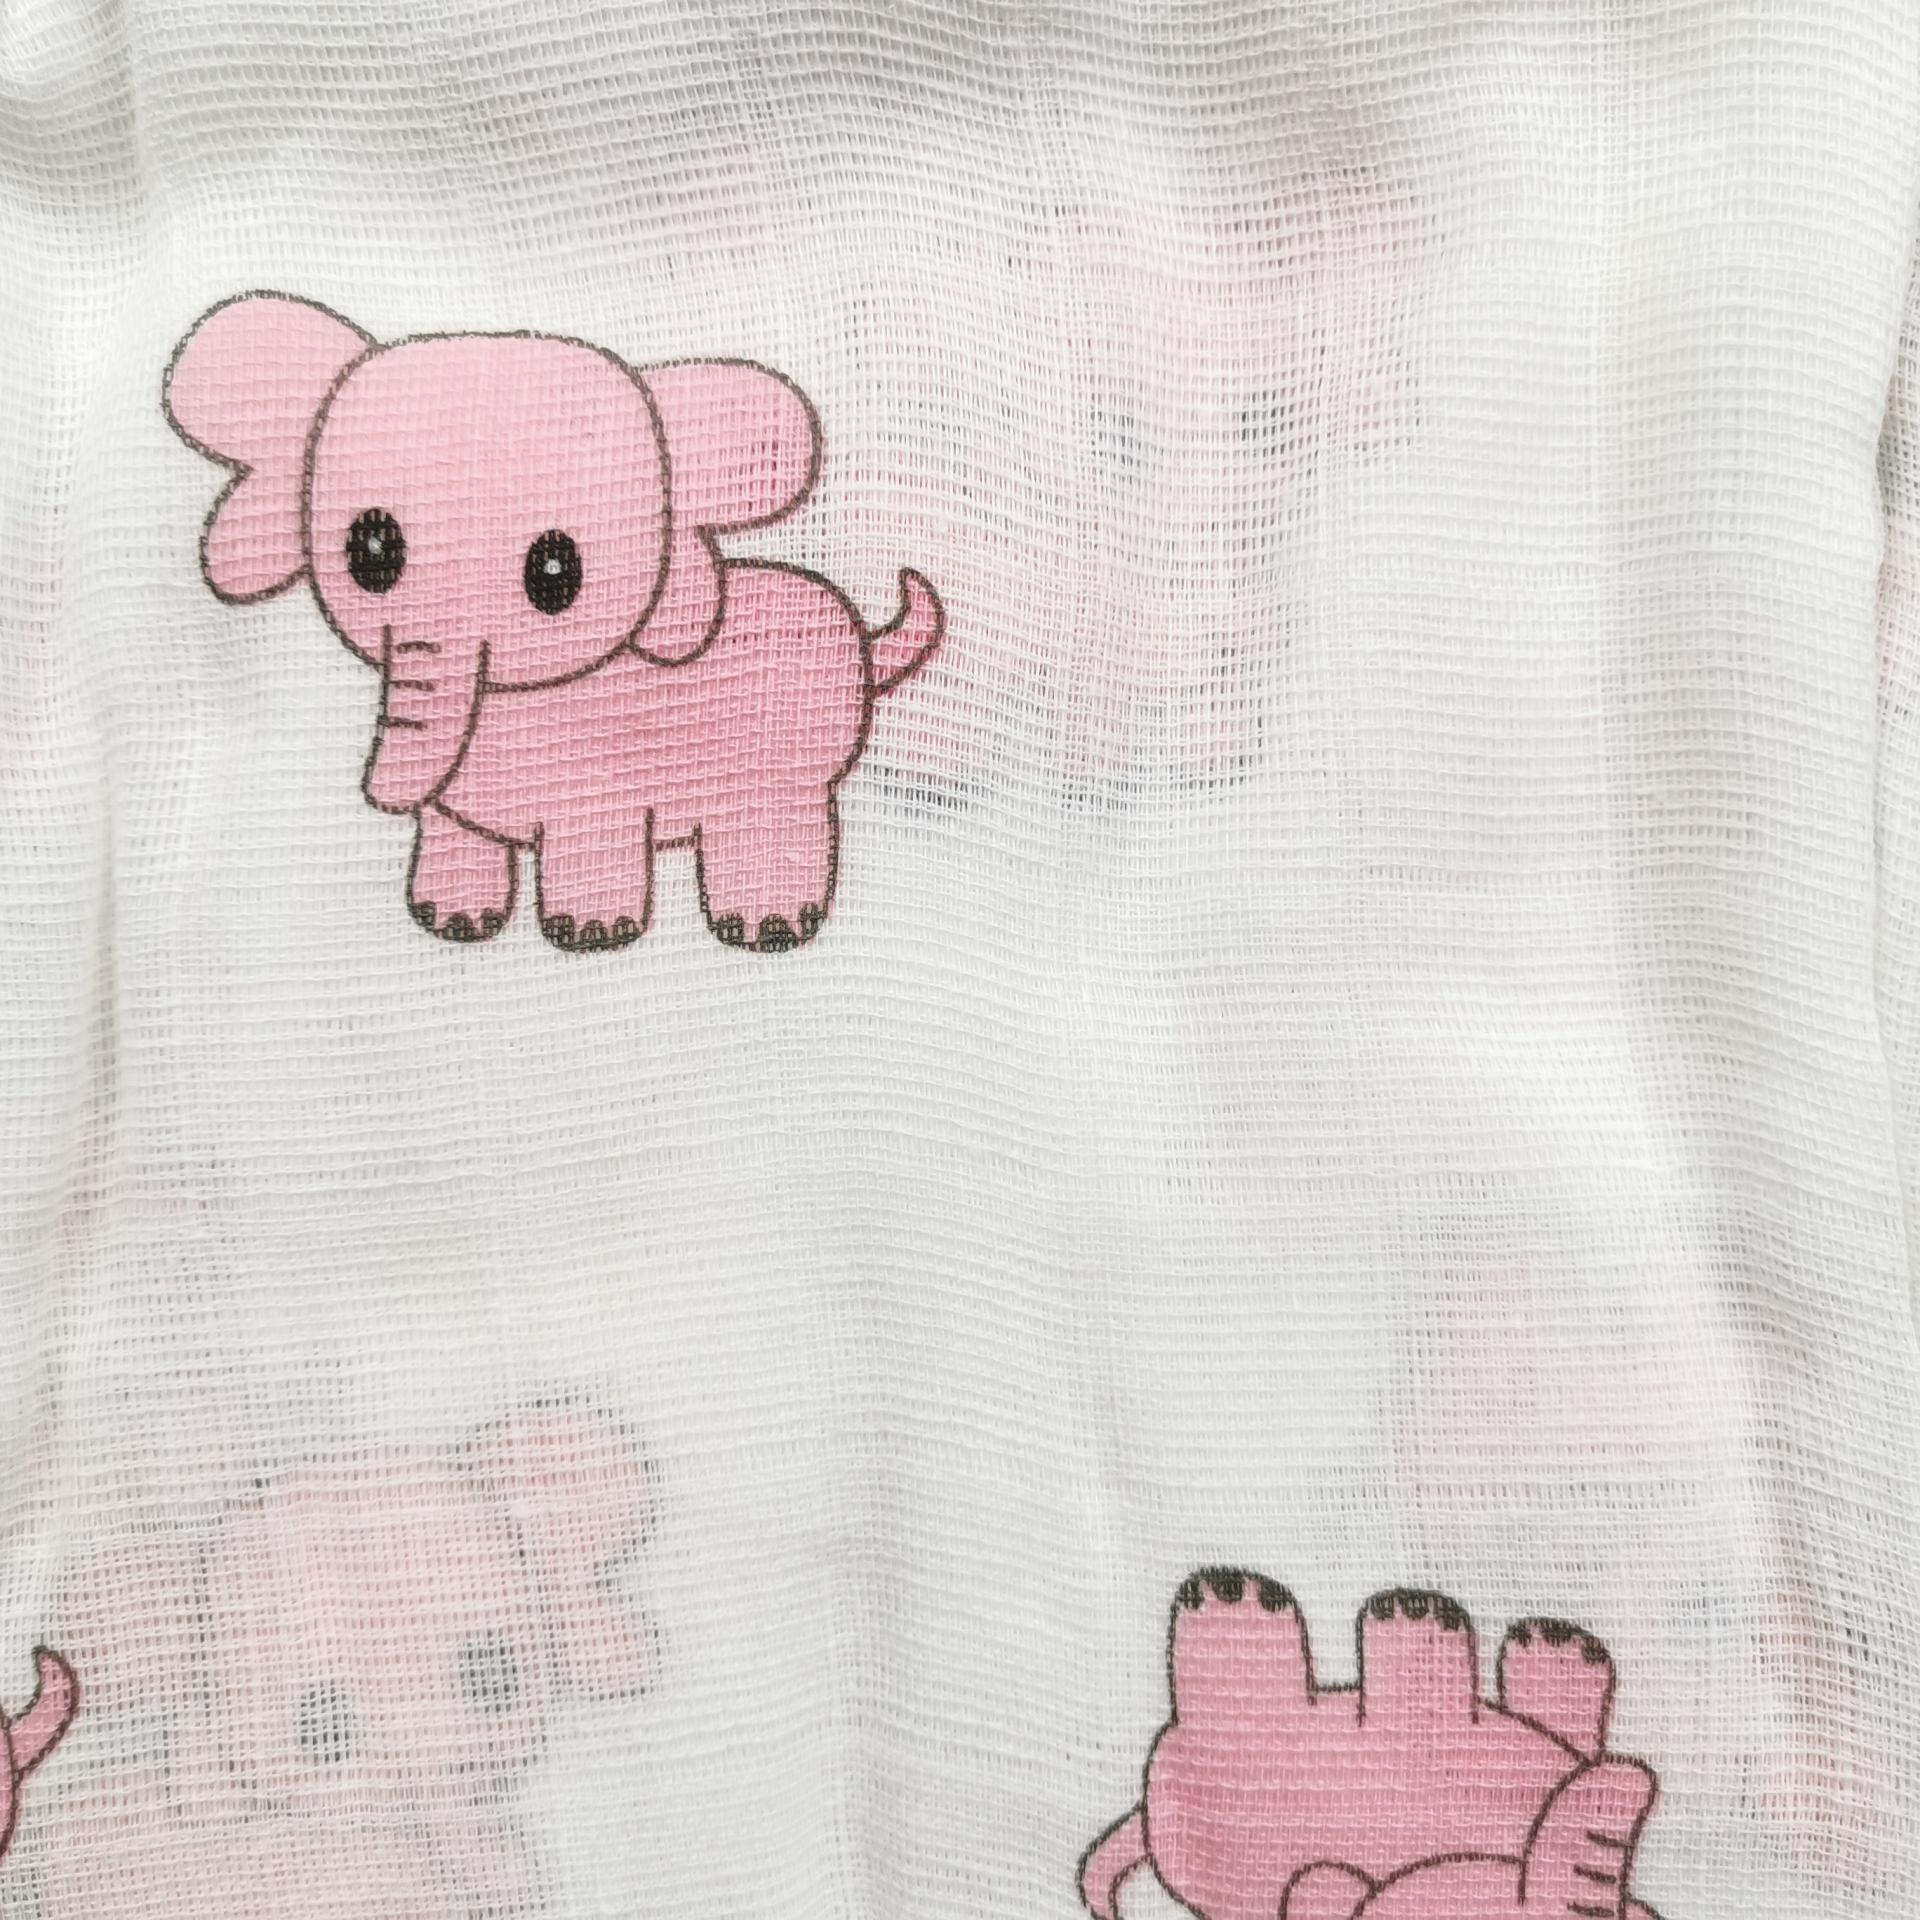 Muselina de elefantes rosas